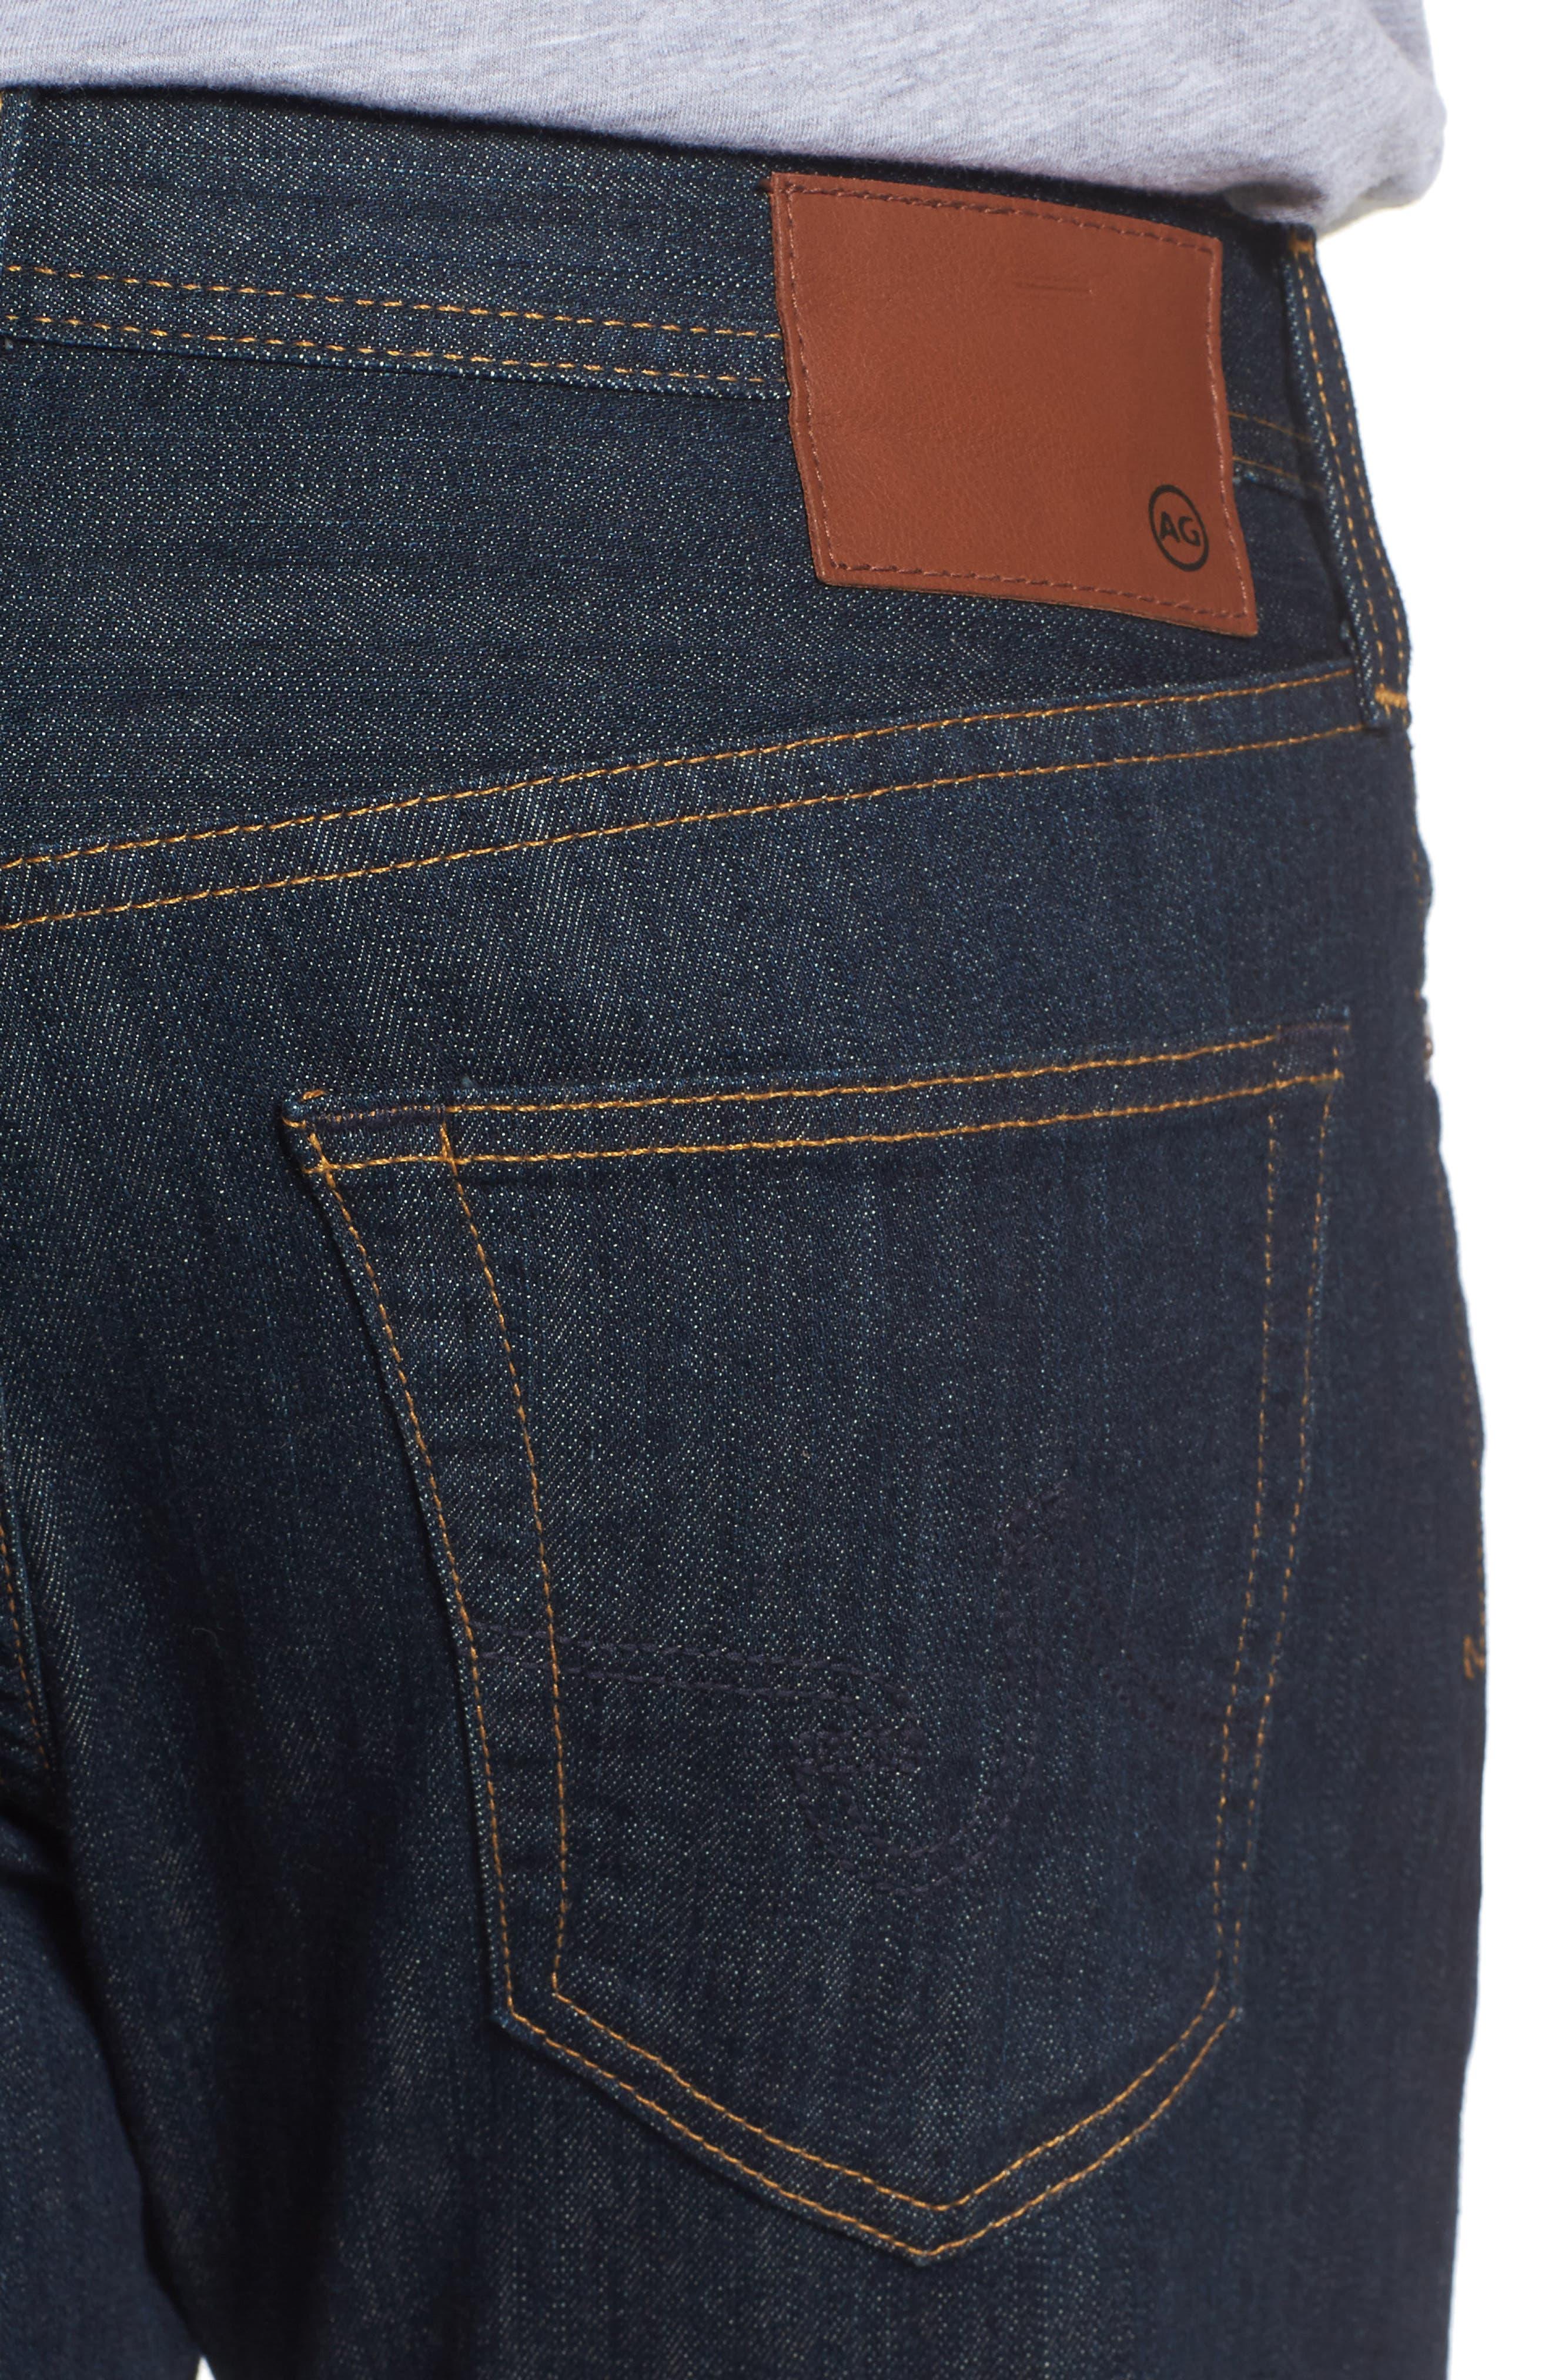 'Protégé' Straight Leg Jeans,                             Alternate thumbnail 4, color,                             Blake